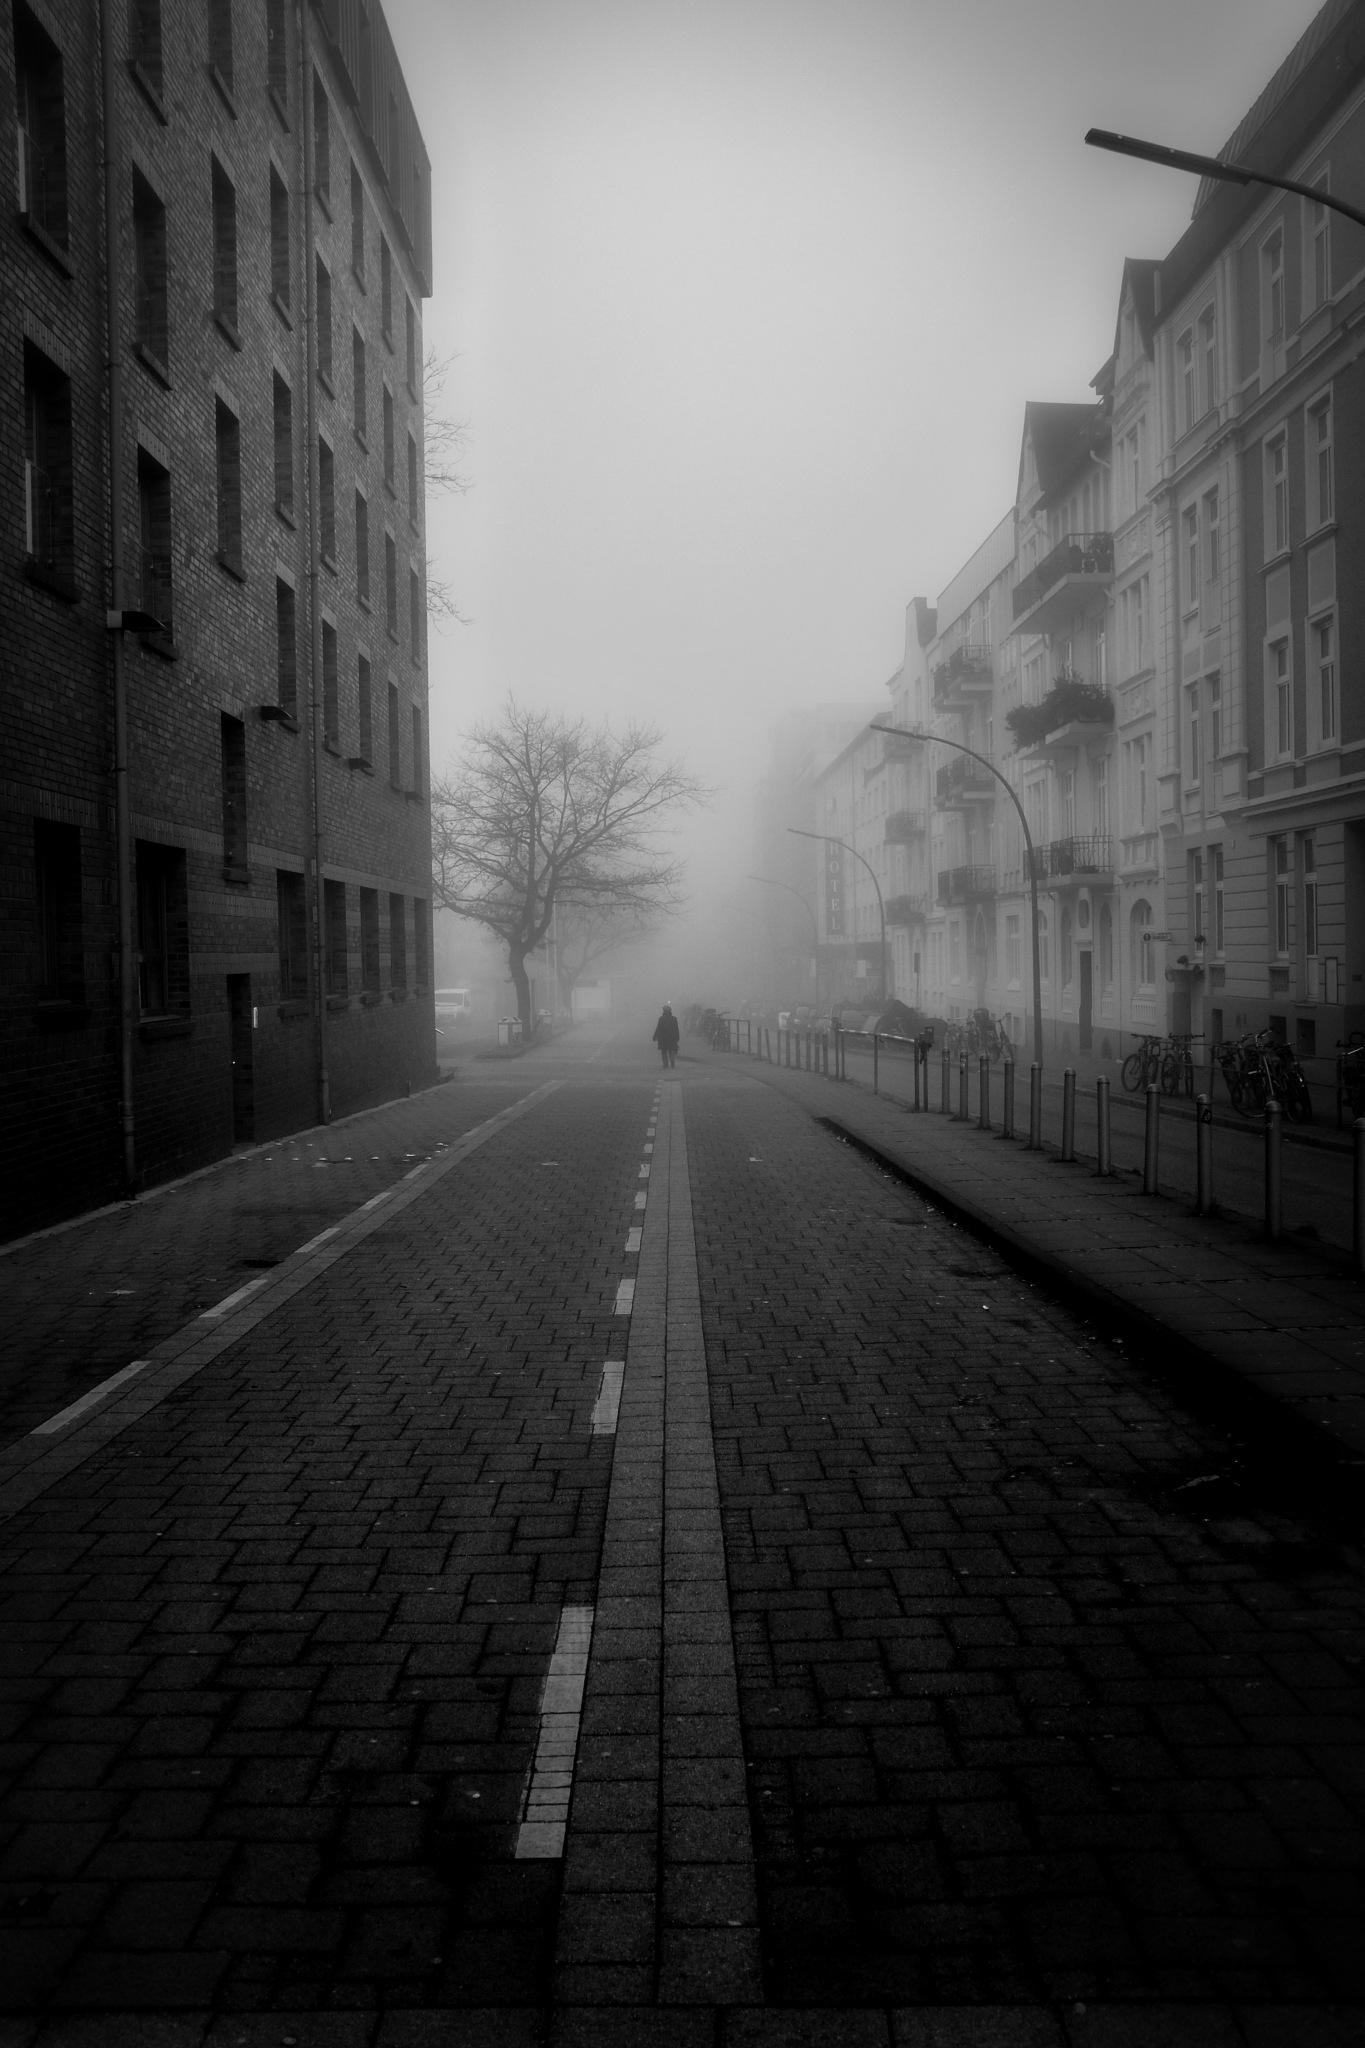 Hamburg am Morgen by peterkryzun